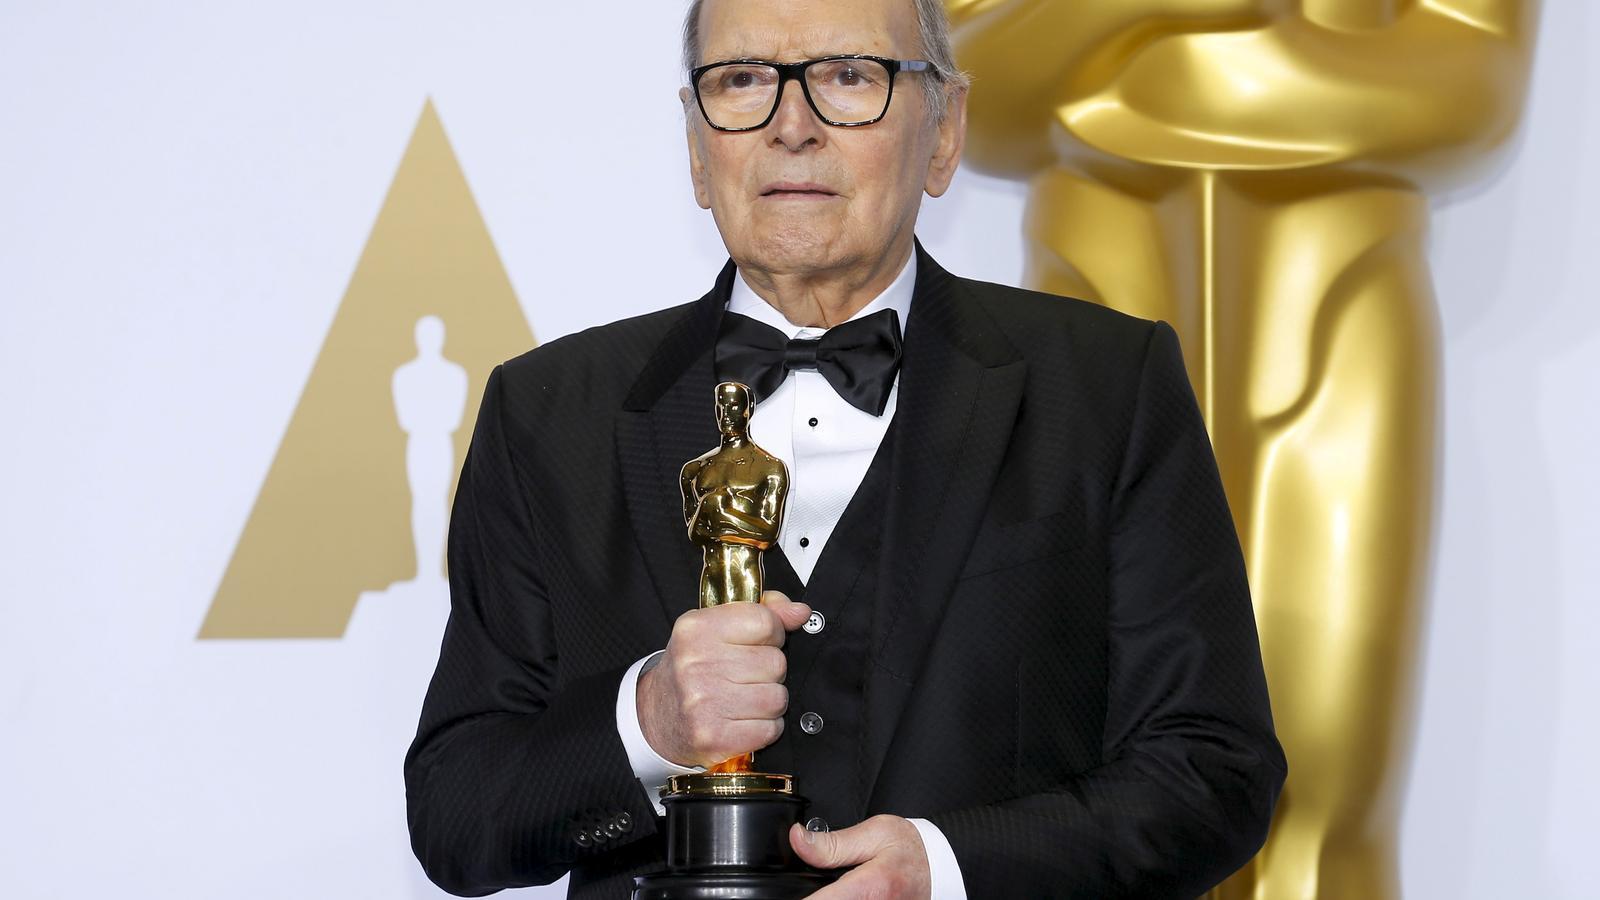 Mor el músic Ennio Morricone als 91 anys